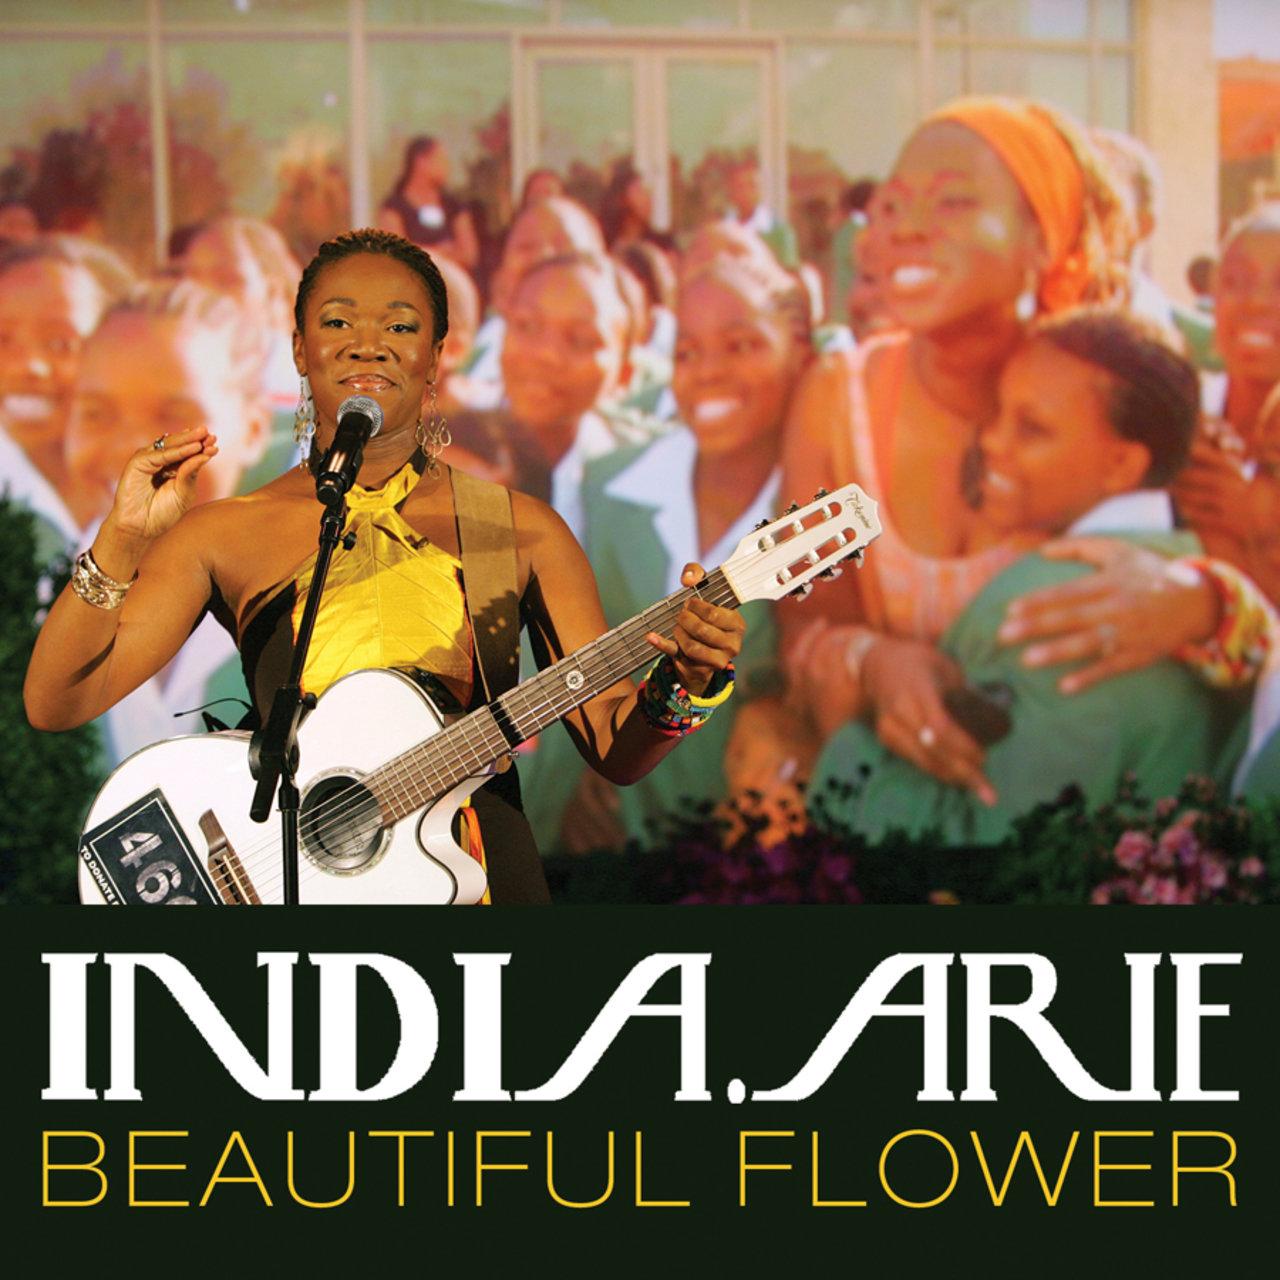 Tidal Listen To Beautiful Flower On Tidal